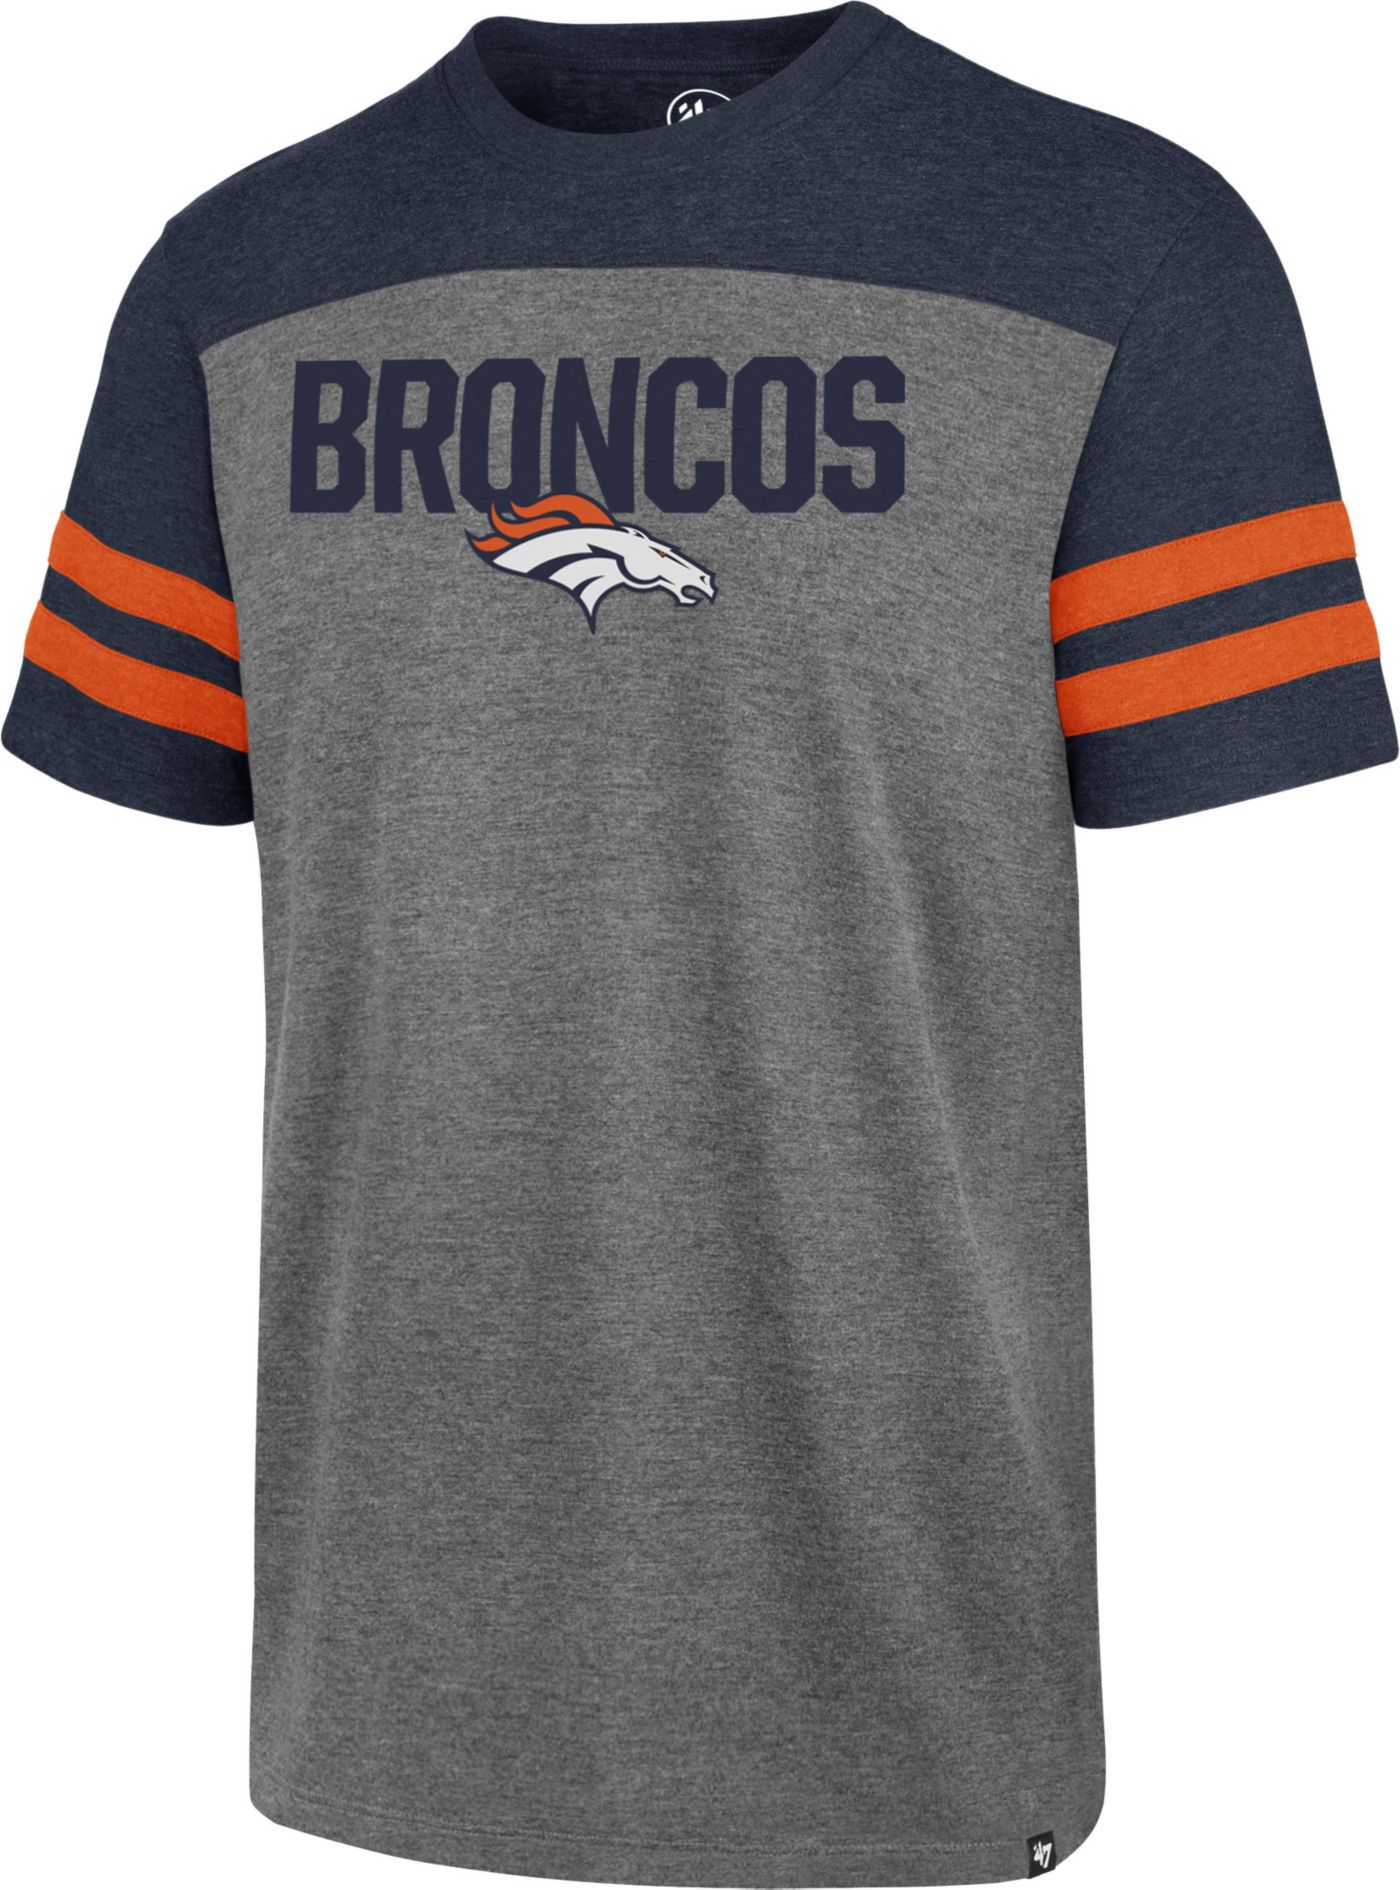 '47 Men's Denver Broncos Versus Club Grey T-Shirt